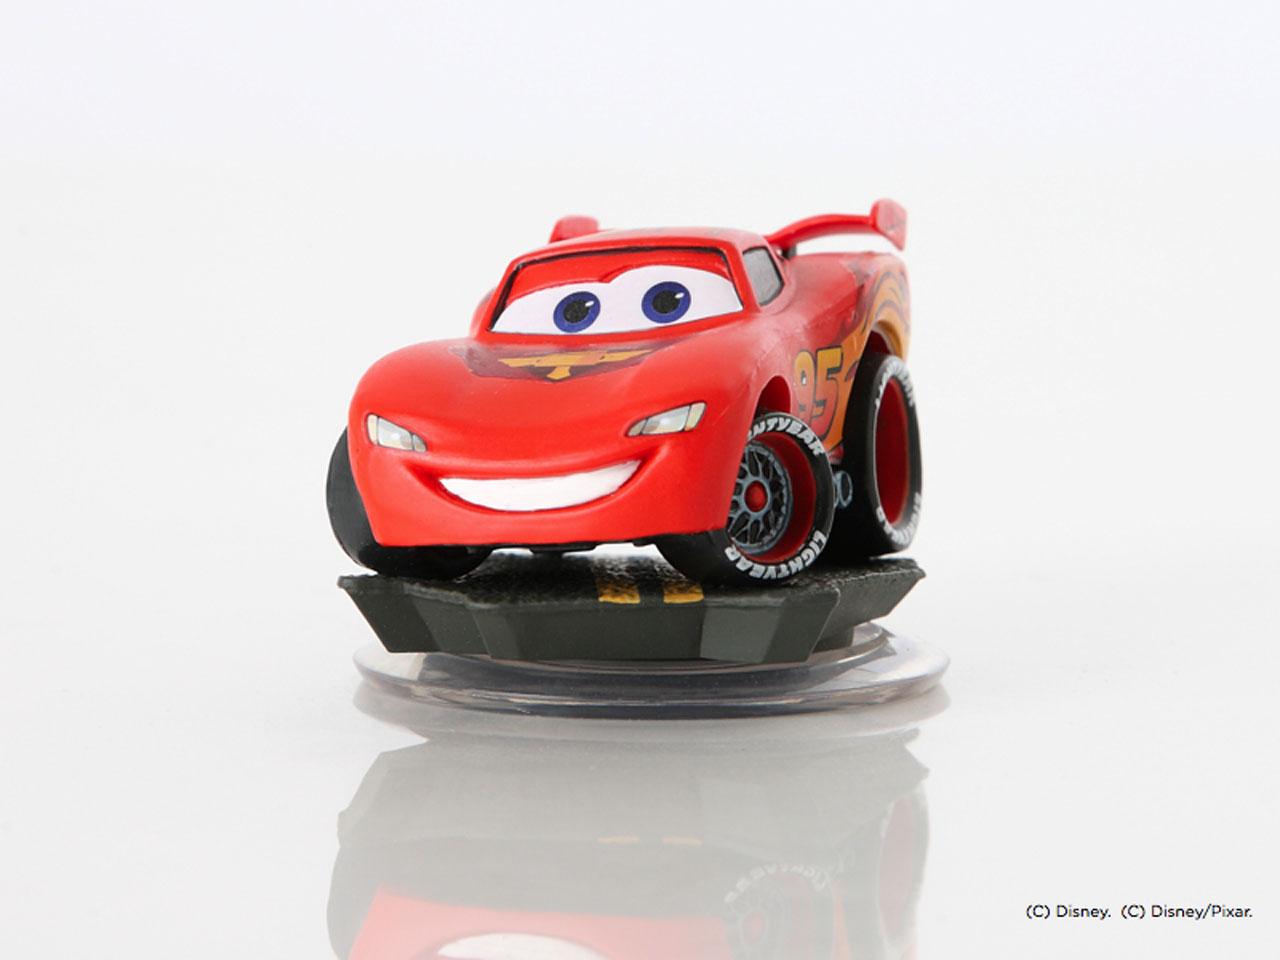 Cars  Comptines et figurines Disney Cars  Collectif  Achat Livre  Fnac